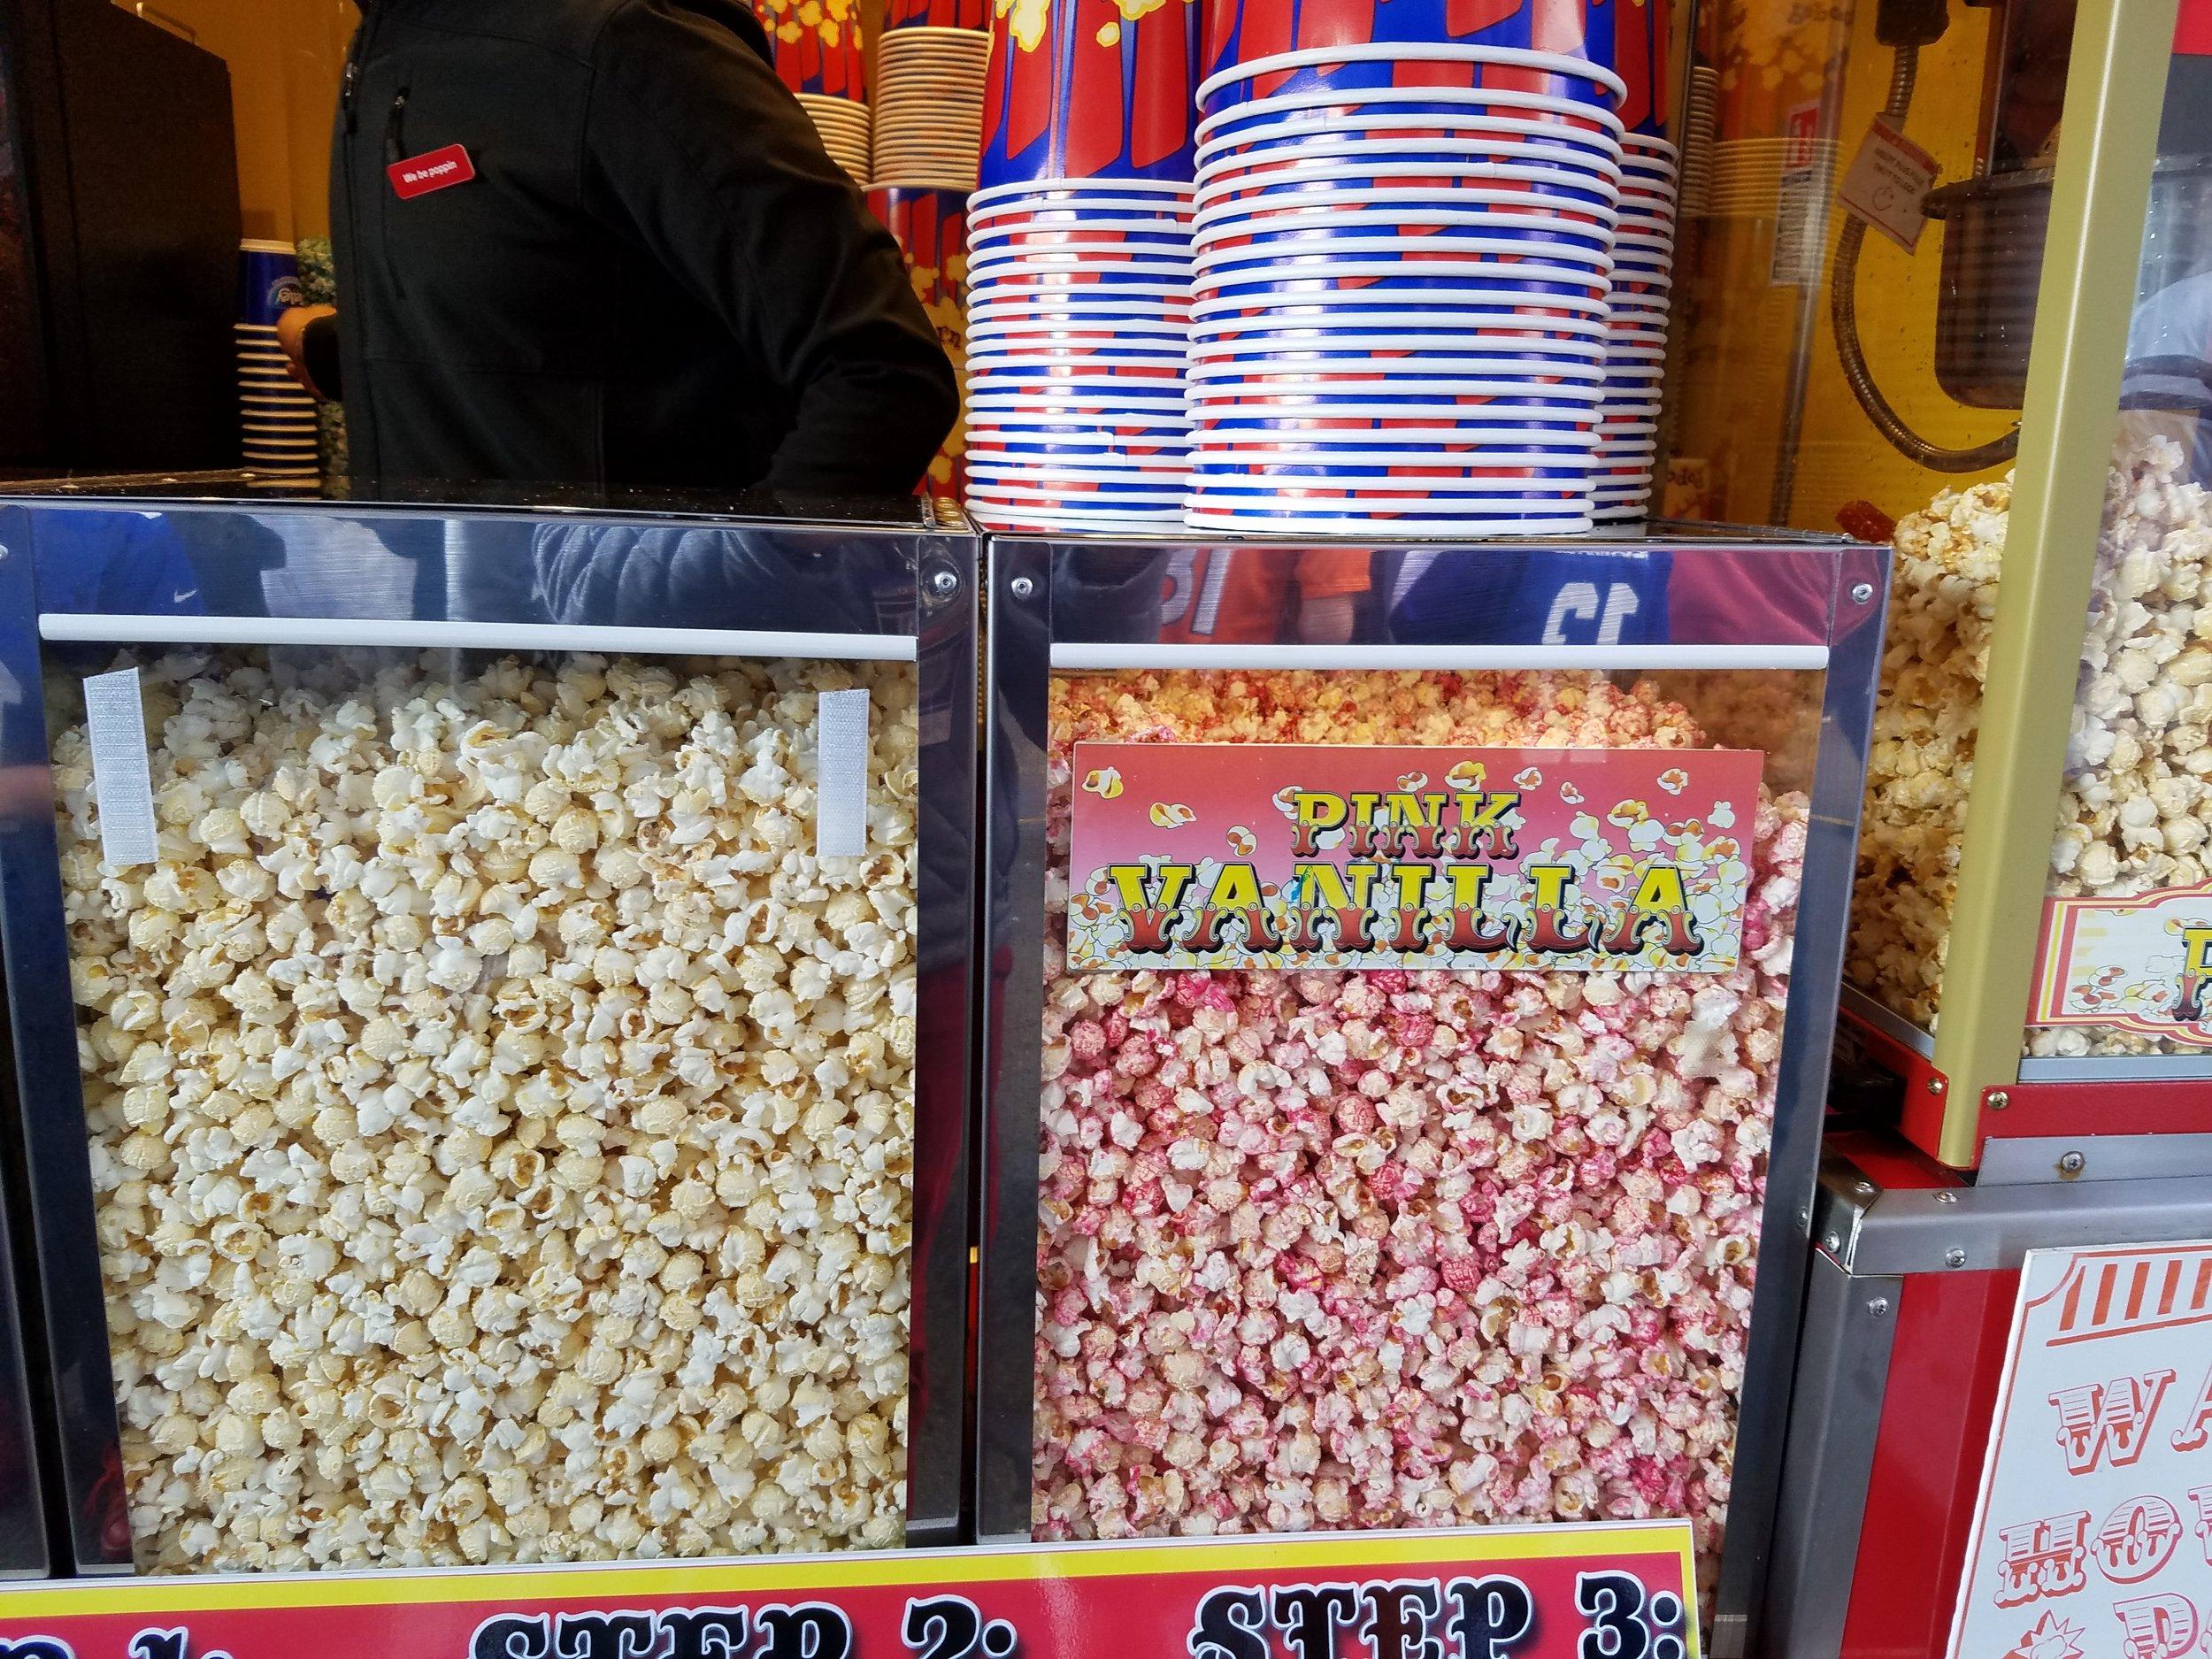 Plenty of popcorn options including pink vanilla.